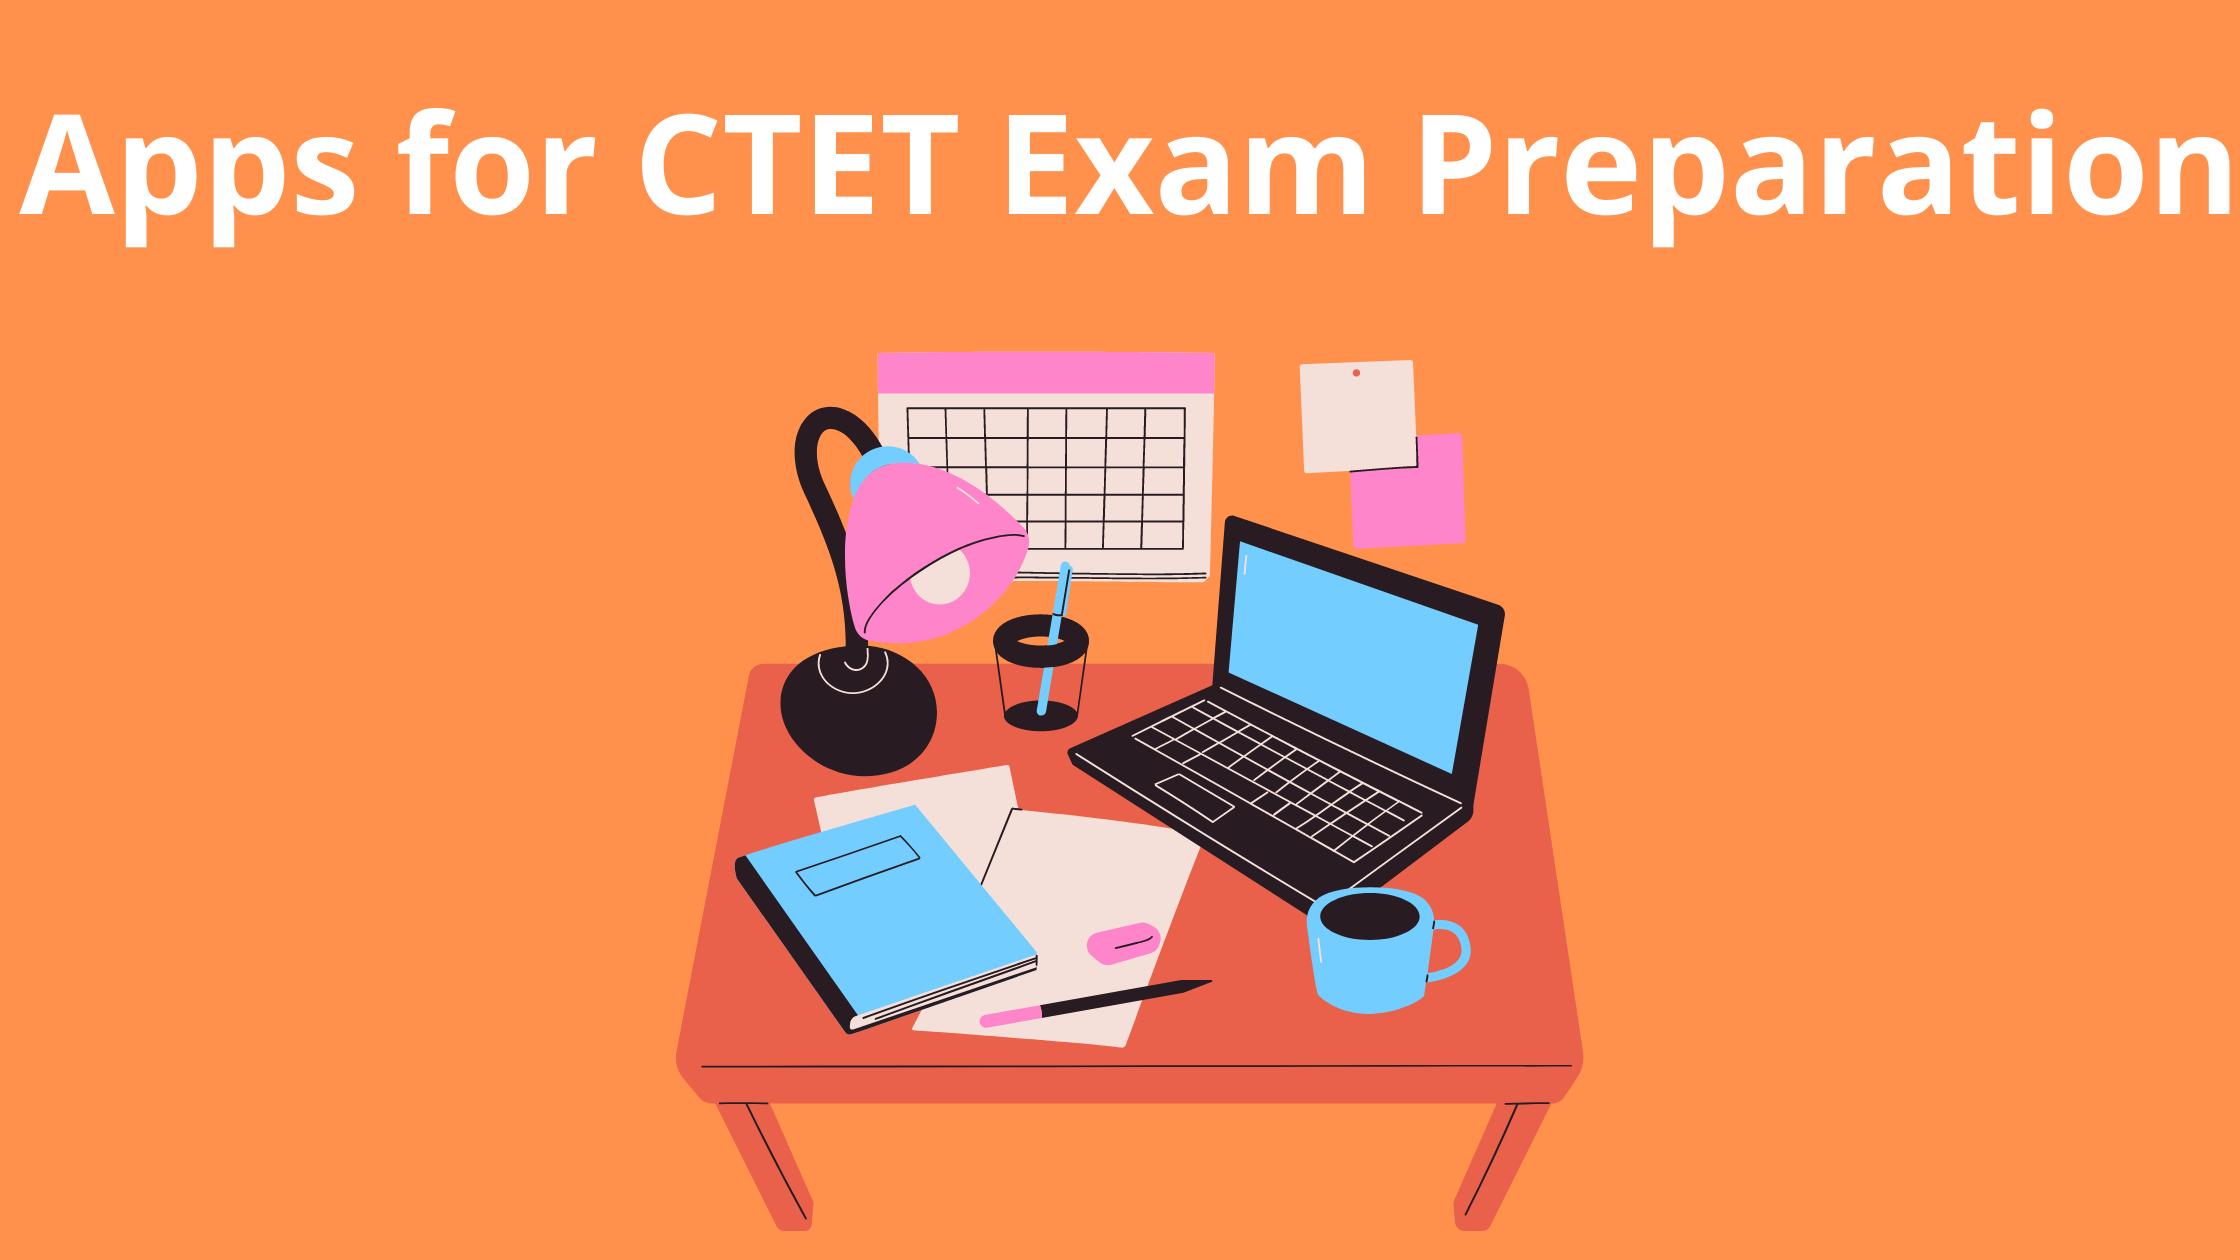 Best Applications for CTET Preparation